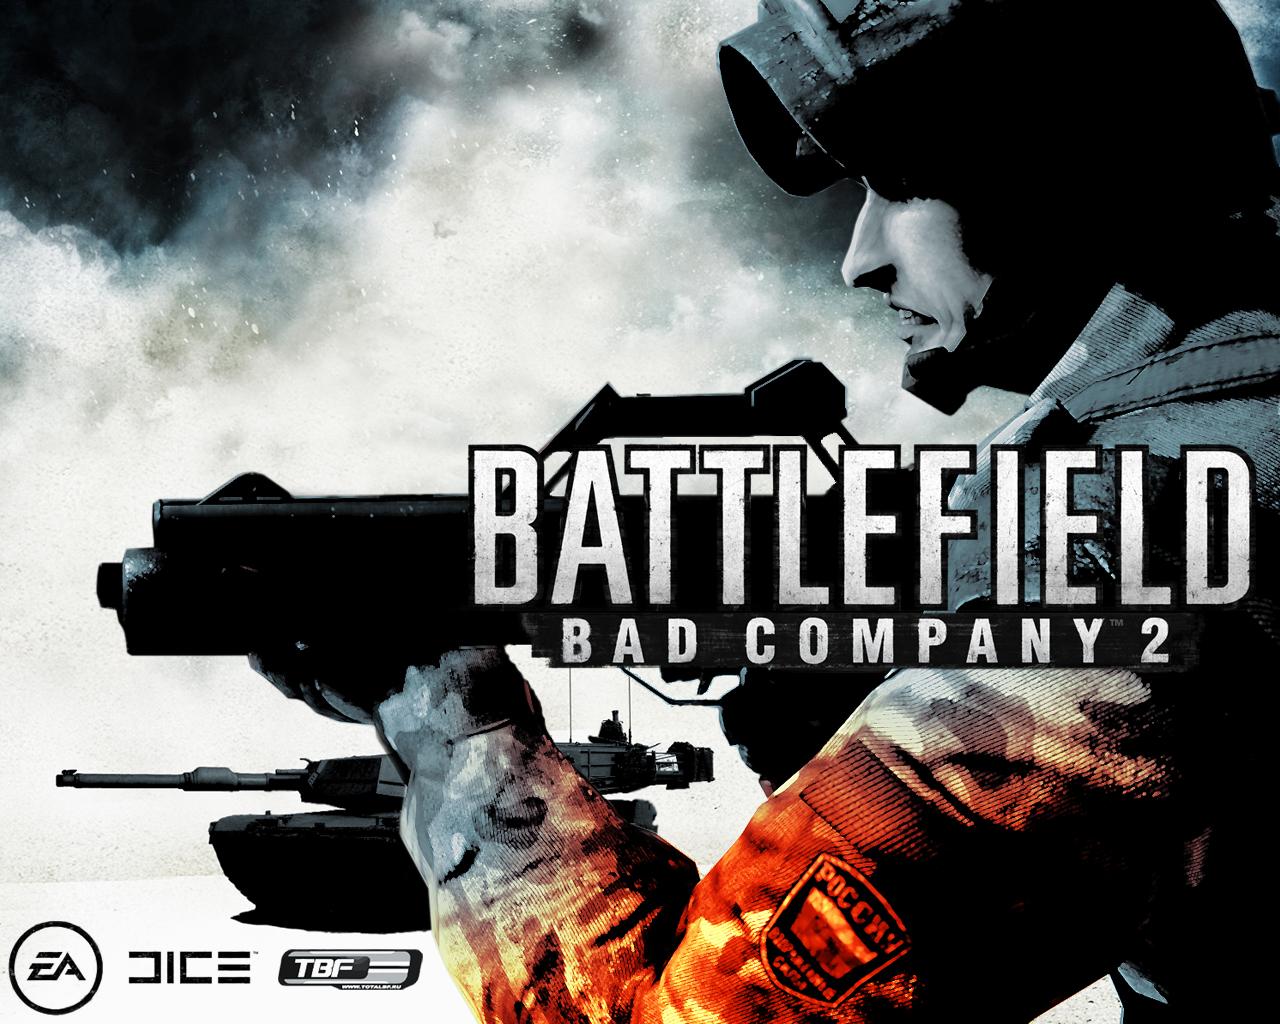 http://2.bp.blogspot.com/-KTrwrbY91ss/T-idFYxL5uI/AAAAAAAAAJA/8YBkK5Ym_28/s1600/battlefield-bad-company-2-wallpaper-6.jpg